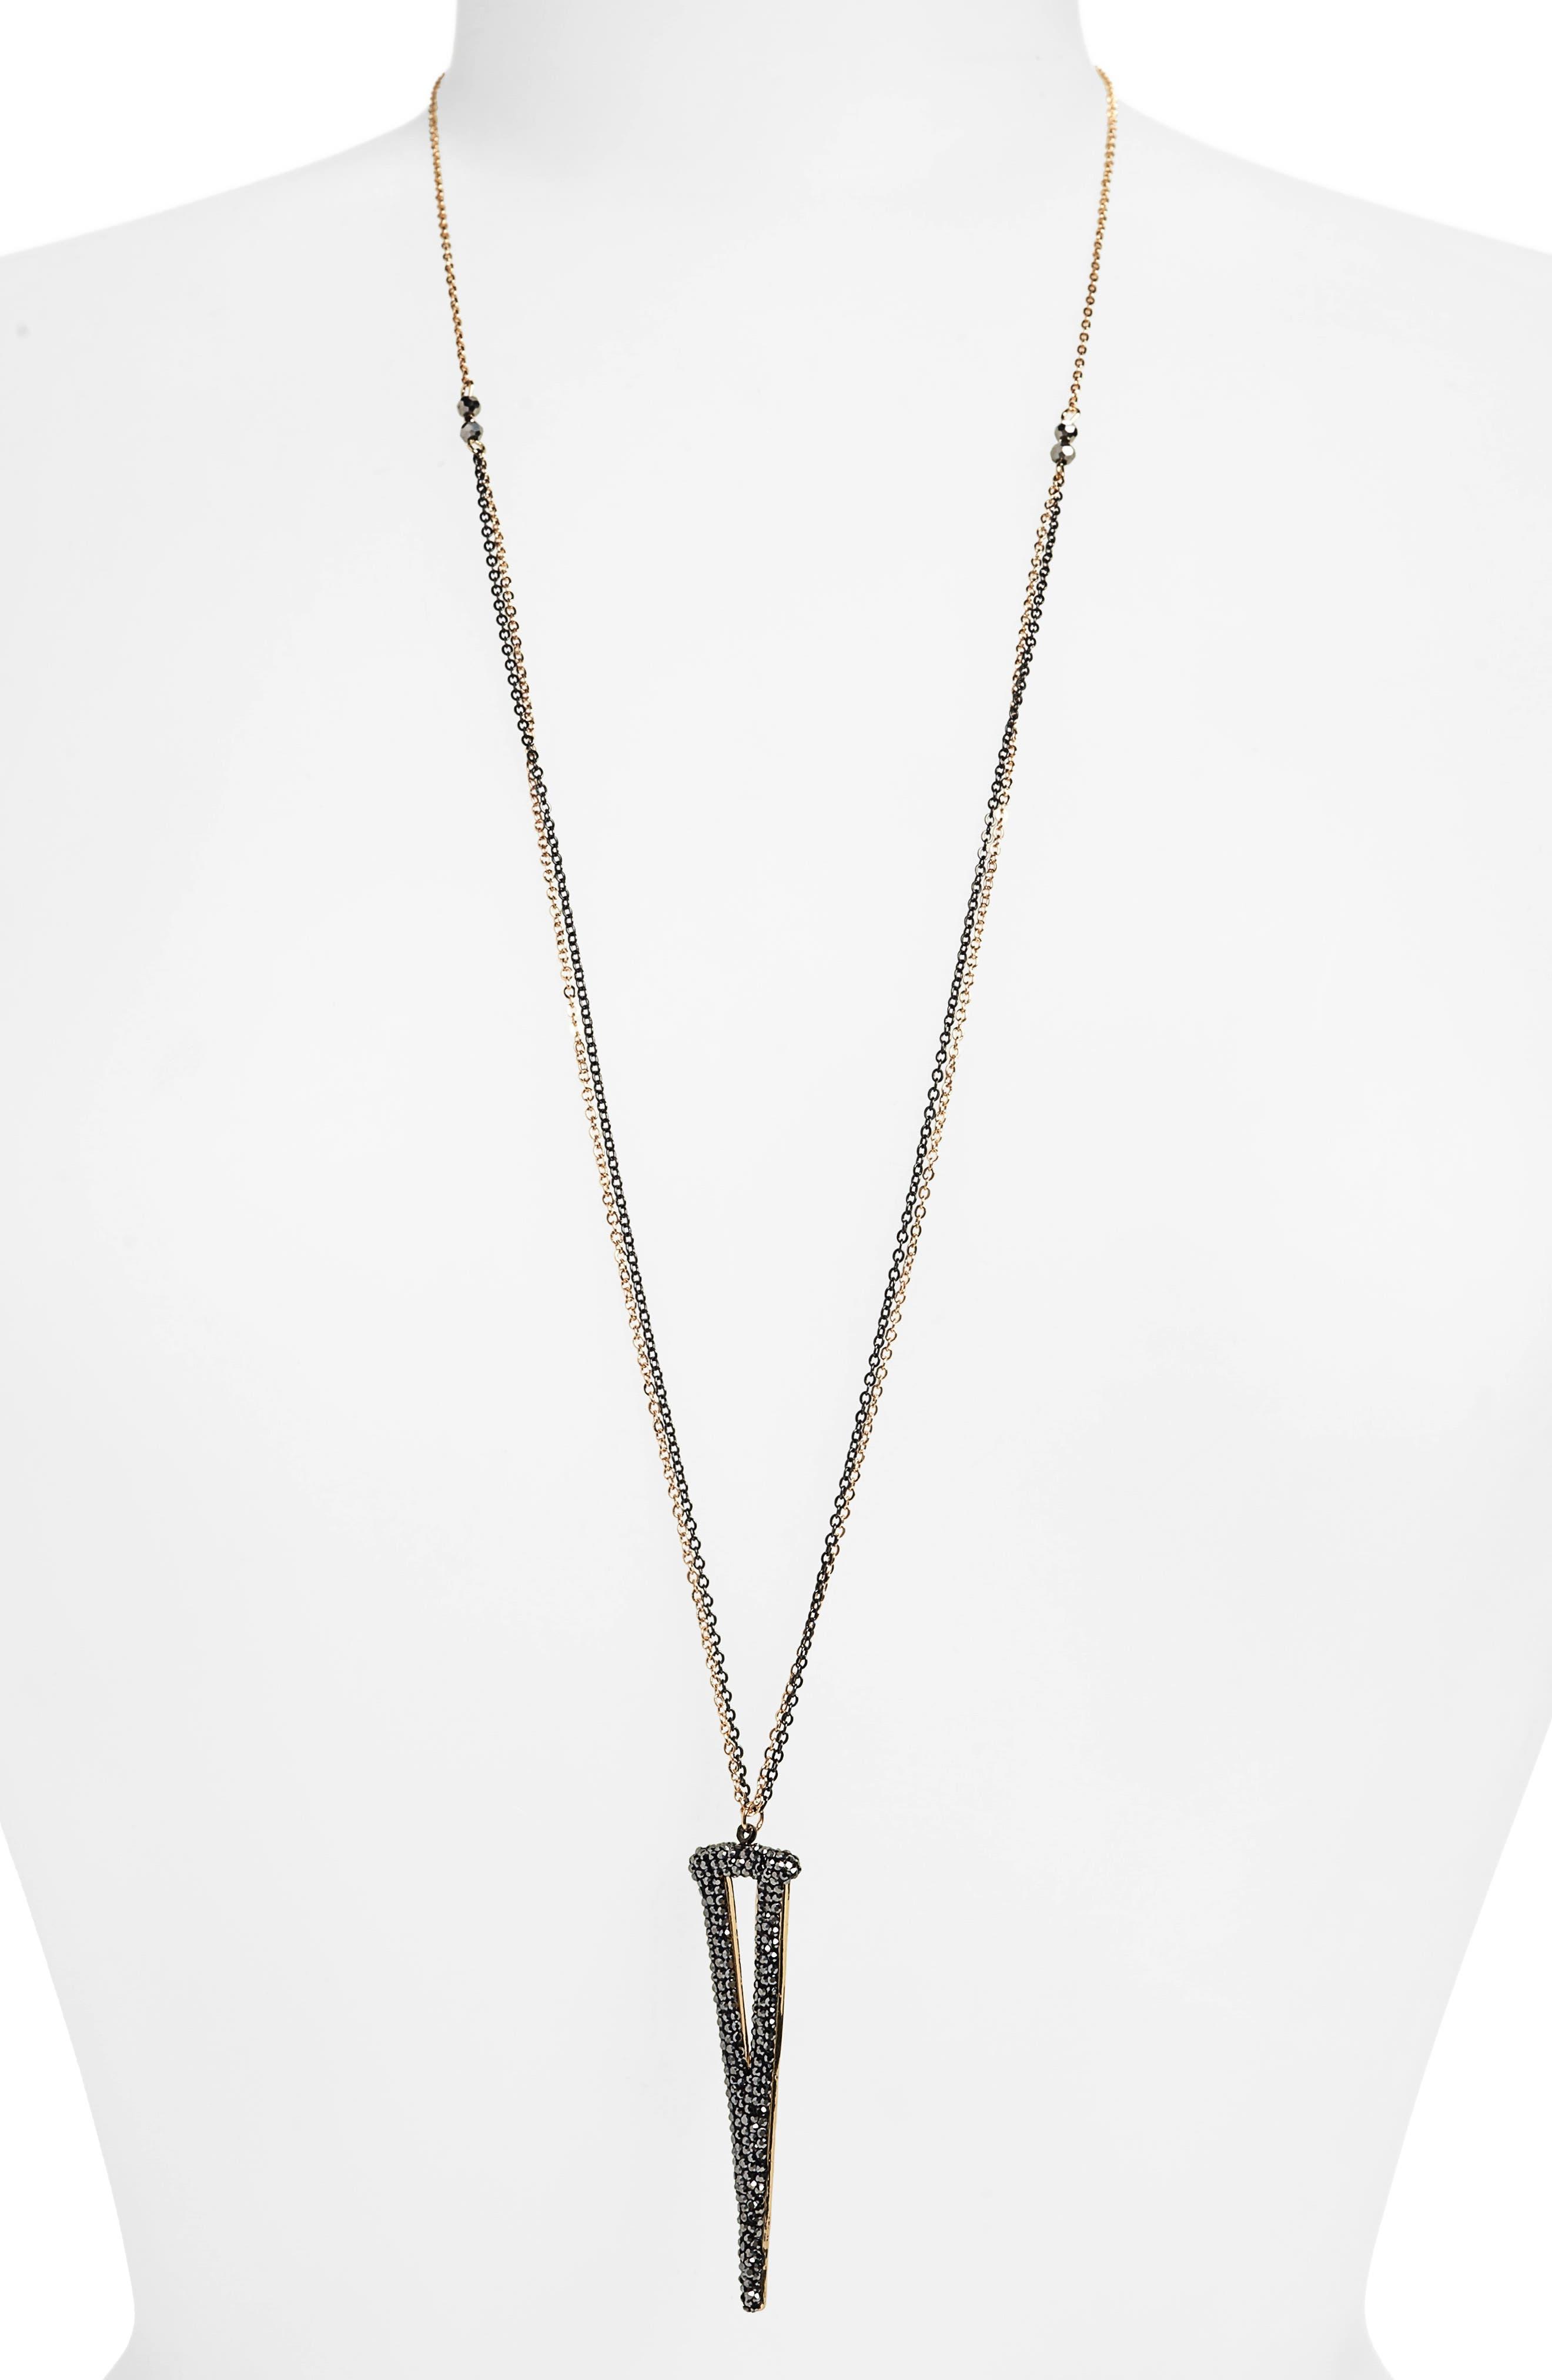 PANACEA Linear Triangle Pendant Necklace in Hematite